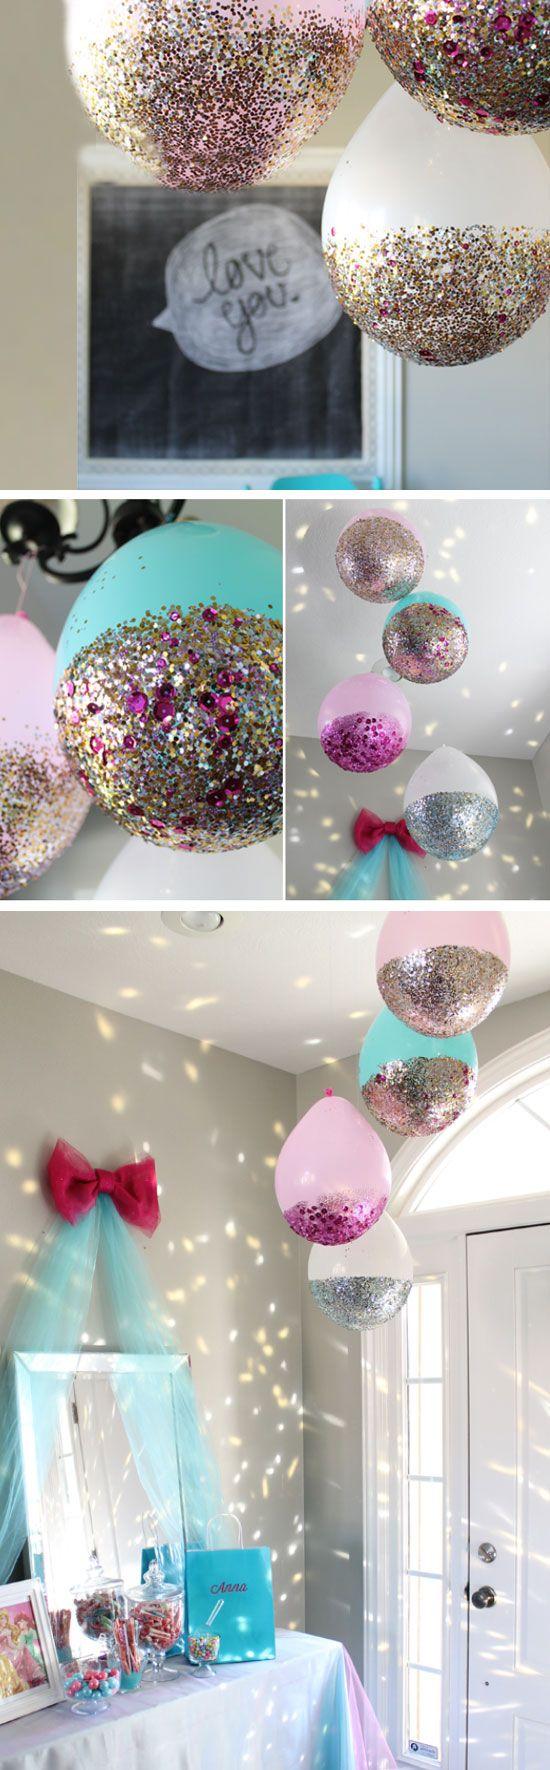 DIY glitter dipped balloons photo